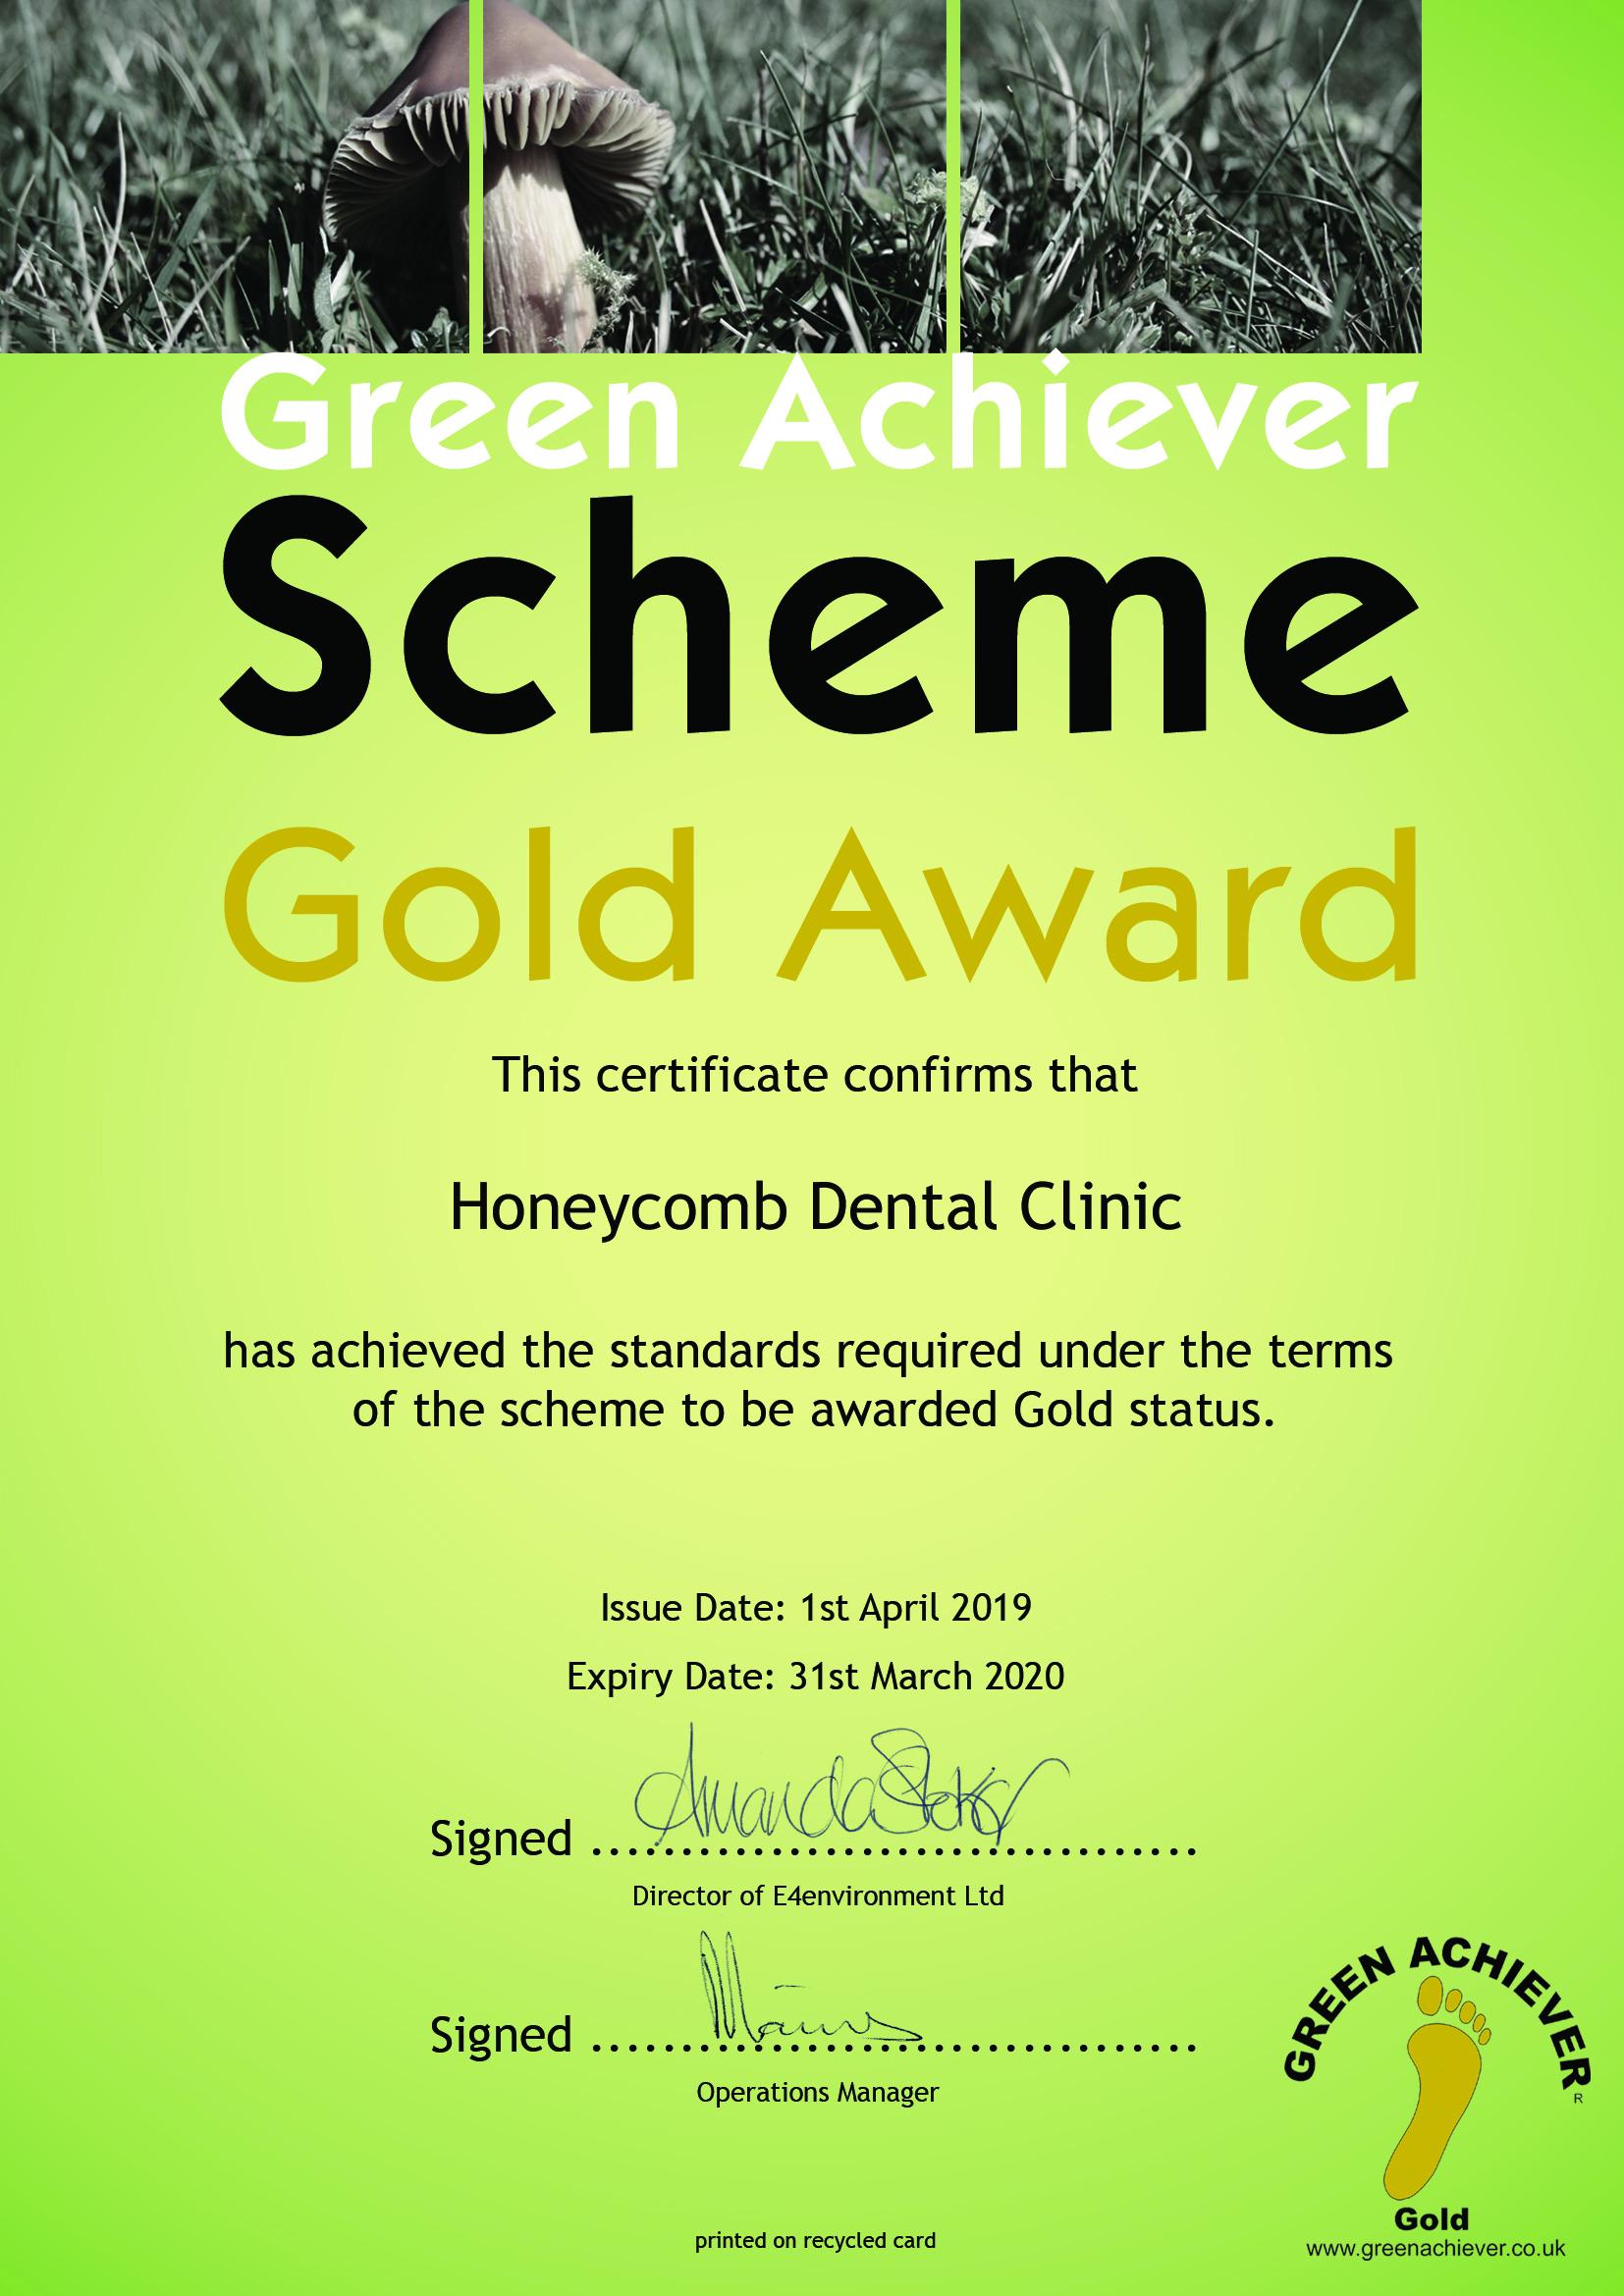 Honeycomb_Gold_Award_Certificate_2019.jpg